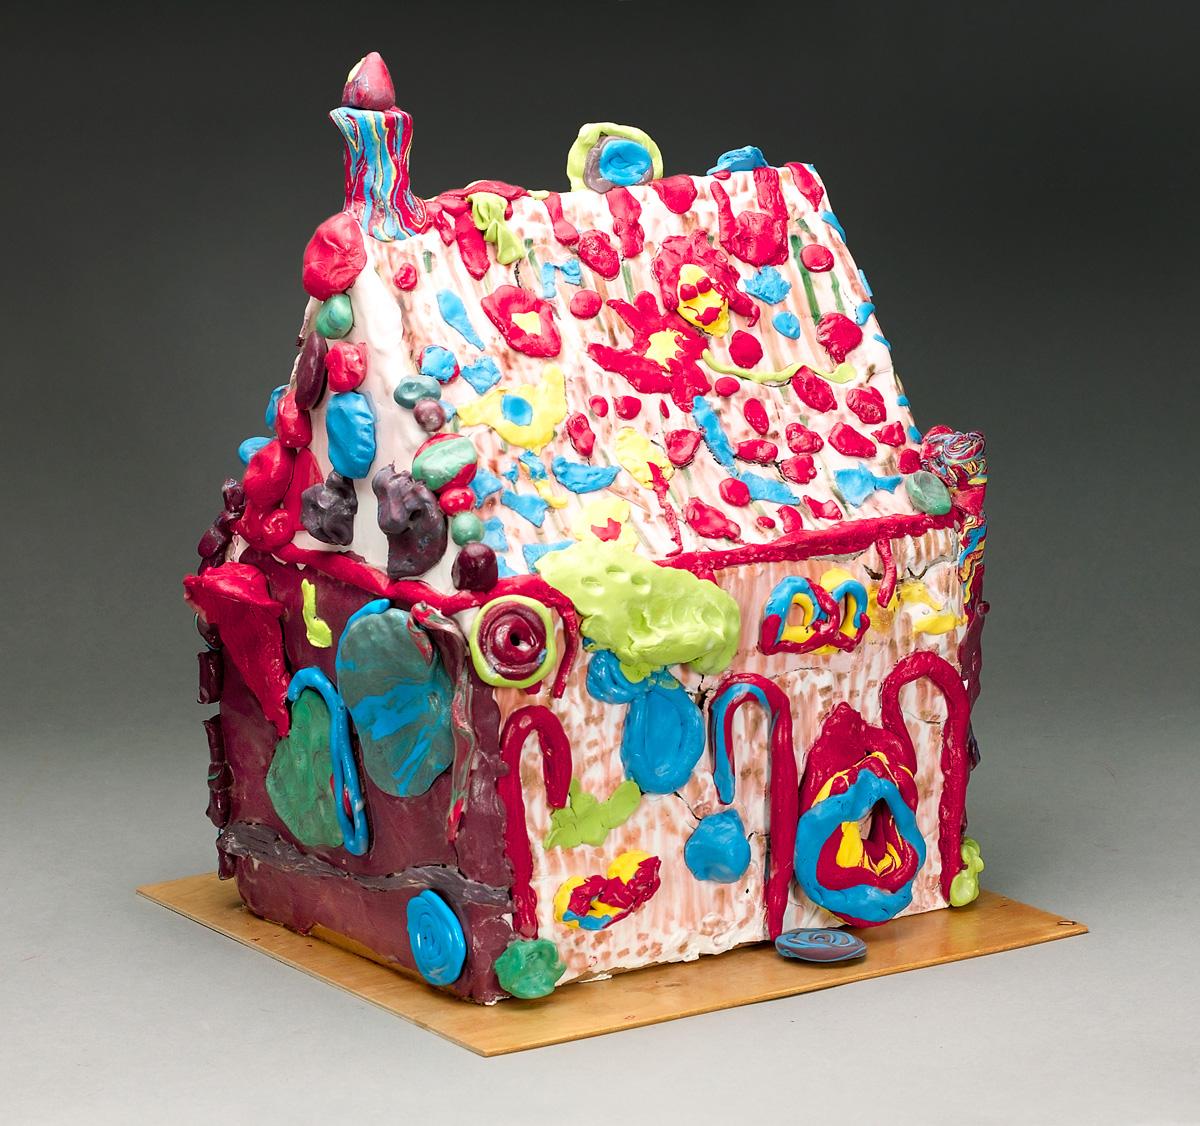 Design House Crafts Uk: Gingerbread House